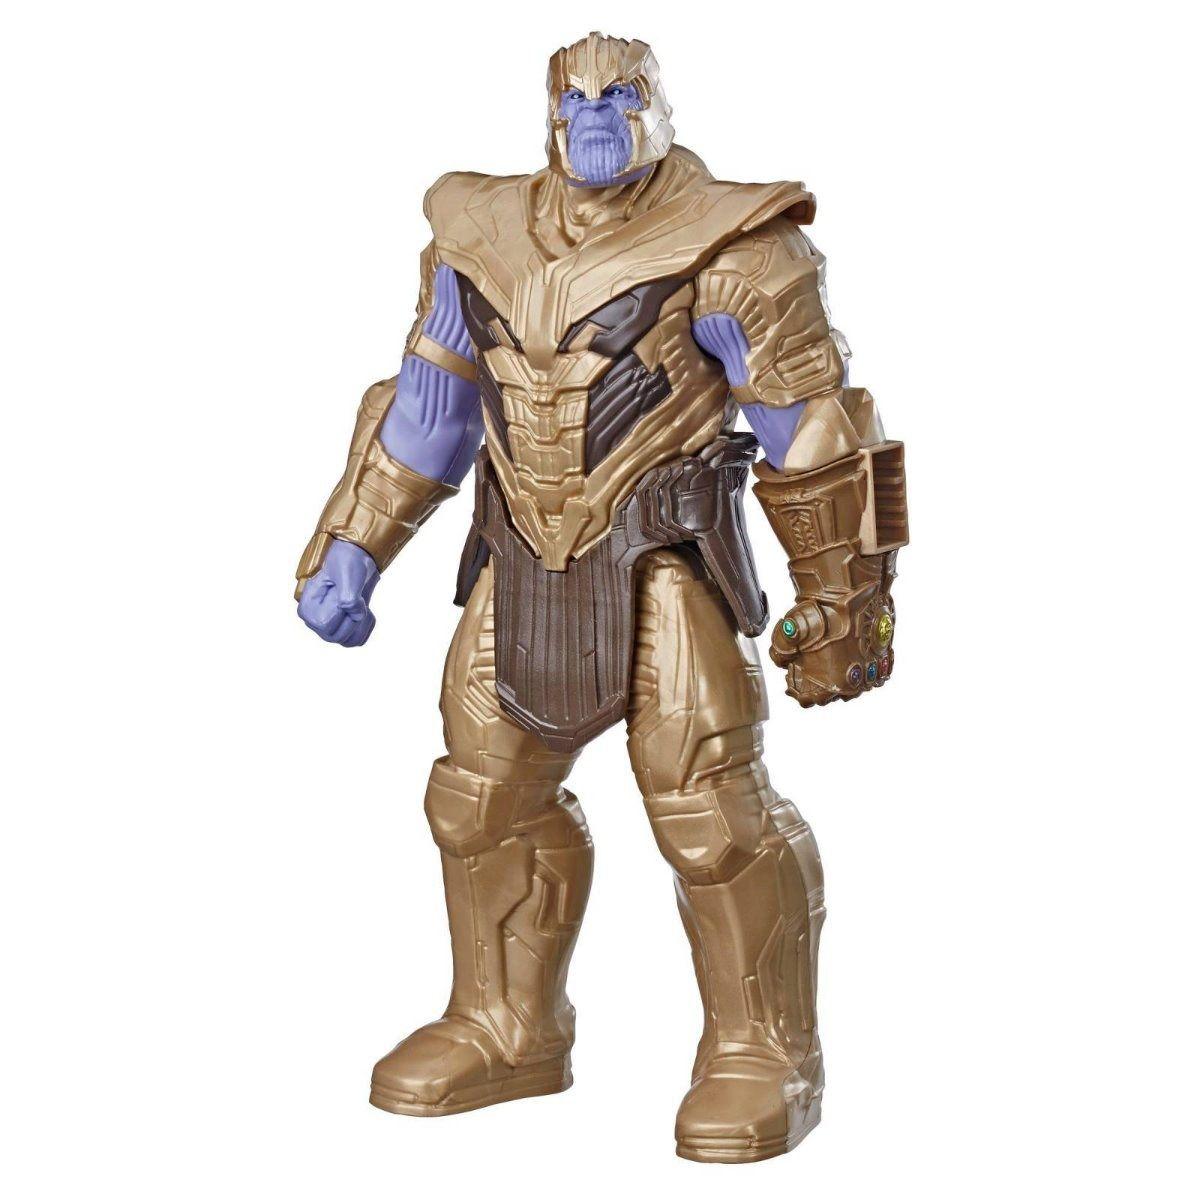 Boneco Thanos + Manopla - Vingadores Ultimato - Avengers